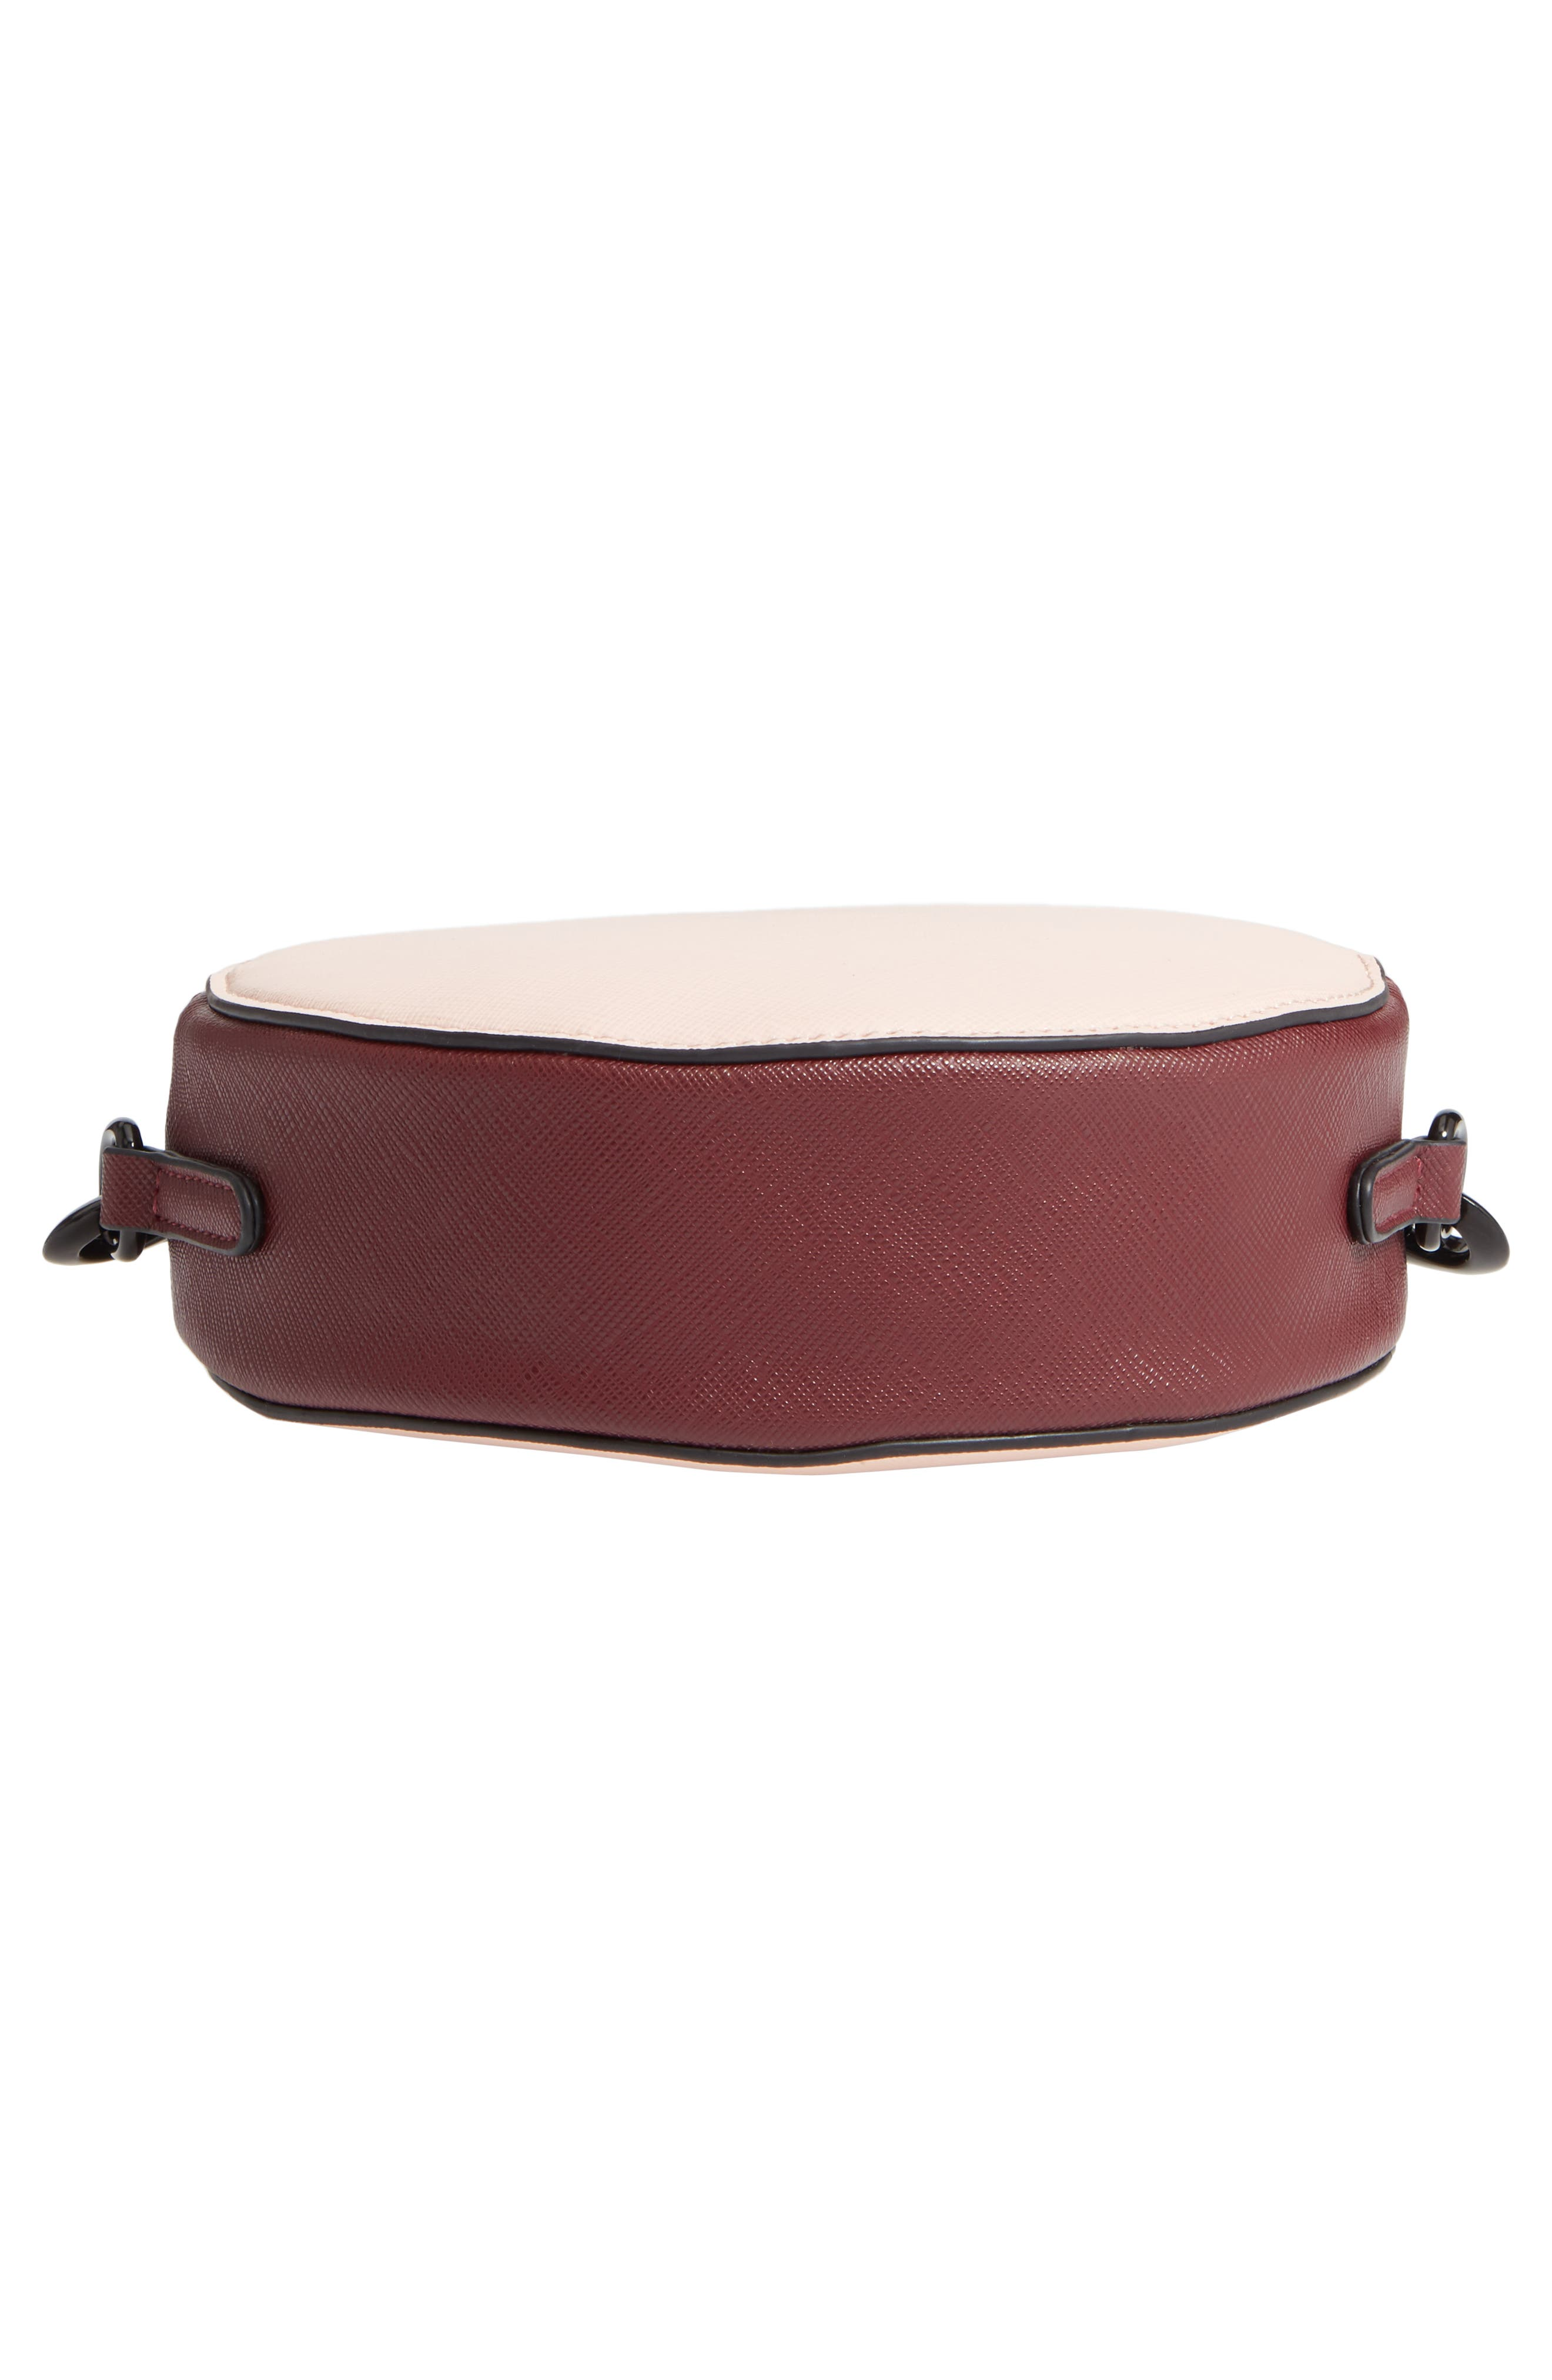 T-SHIRT & JEANS, Faux Leather Colorblock Canteen Crossbody Bag, Alternate thumbnail 8, color, 650